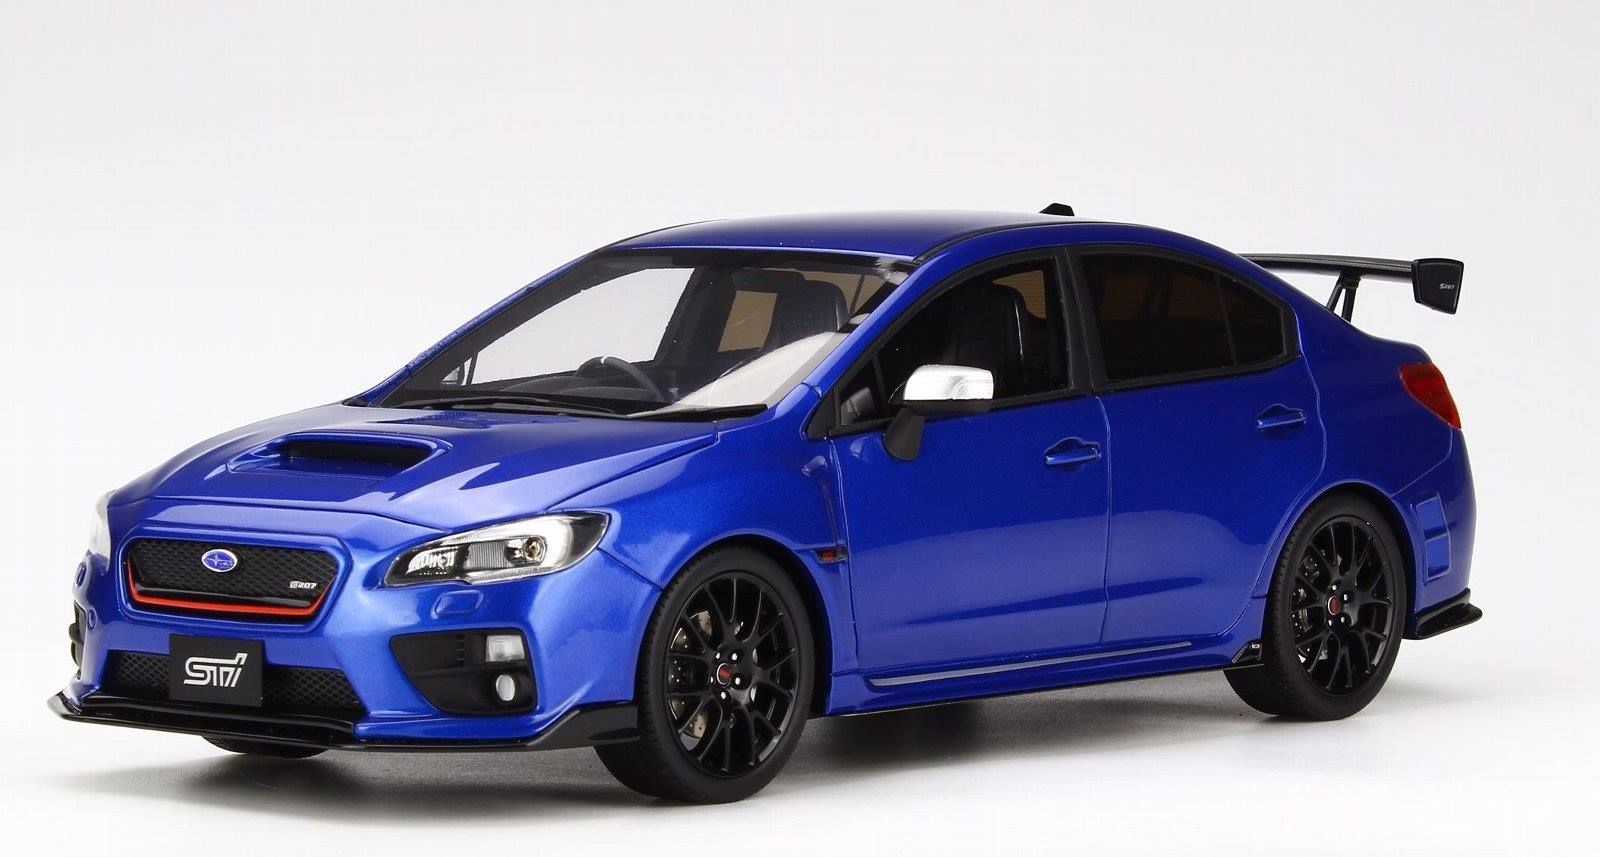 Kyosho 京商 400台限定 1:18 2016年モデル スバル WRX STI S207 NBR Challenge Package WRブルーマイカ2016 Subaru WRX STI S207 NBR Challenge Package resin Samurai series 1/18 by Kyosho JPN